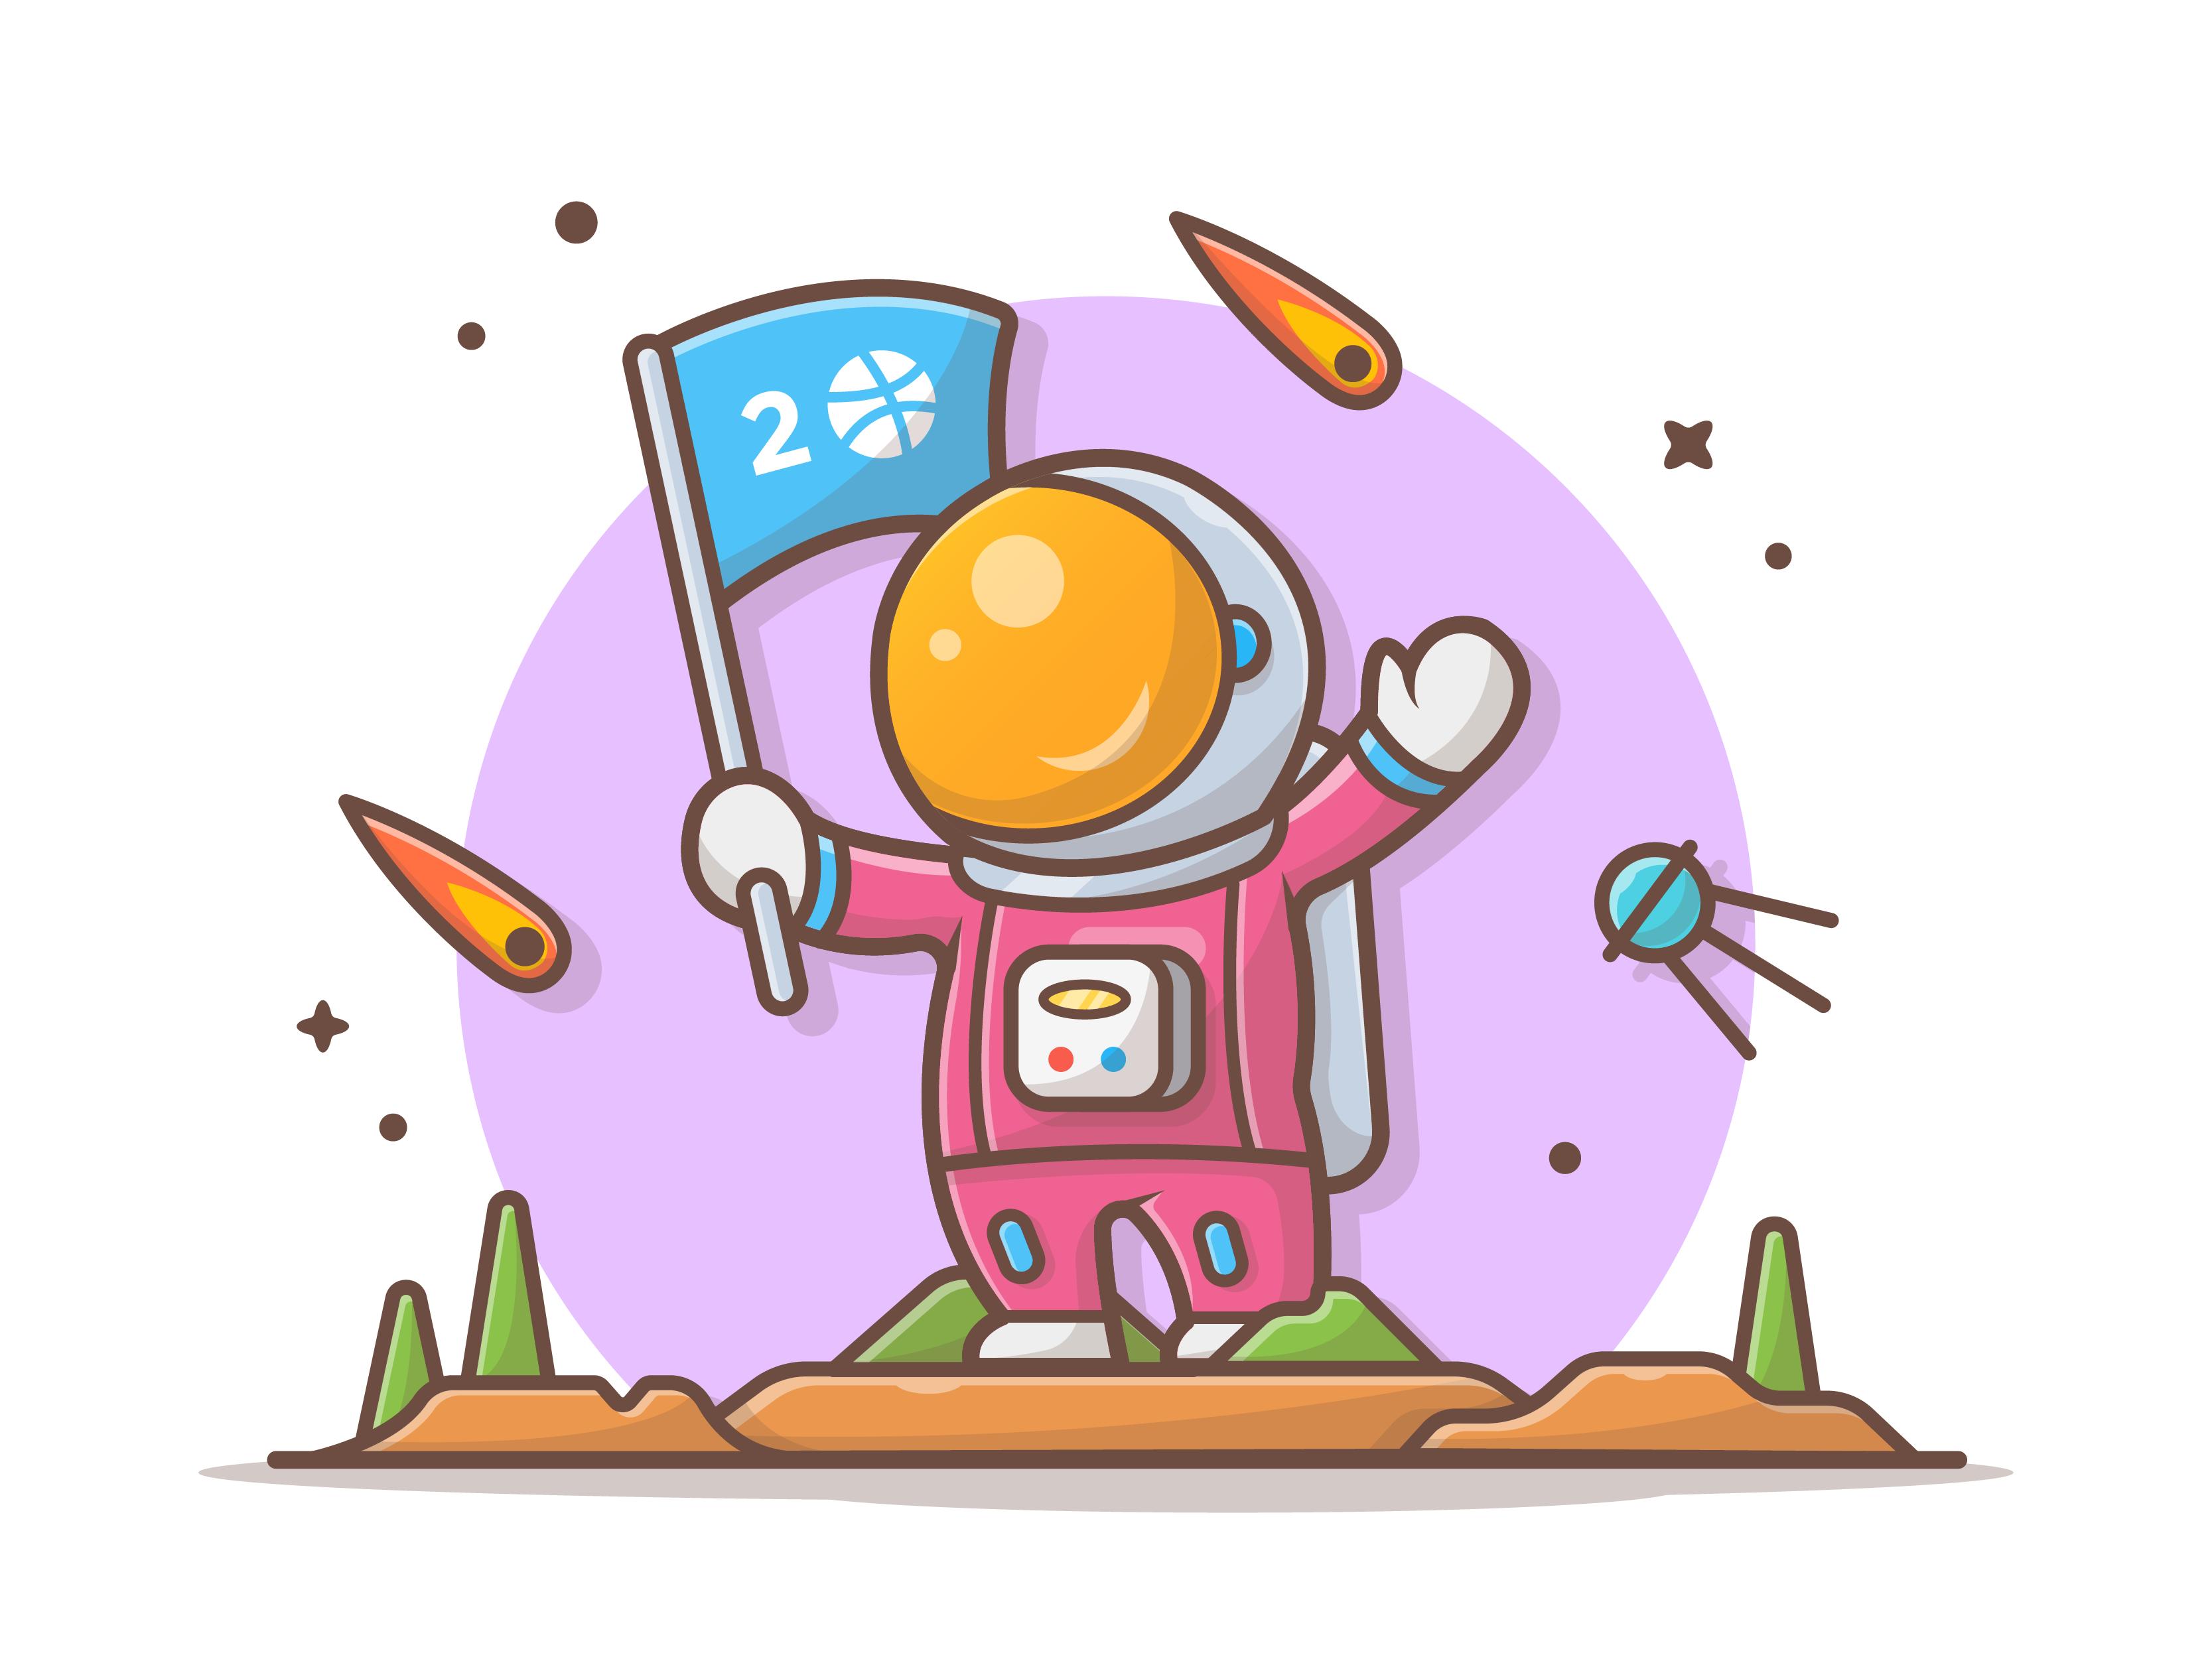 Astro holding flag dribbble 08